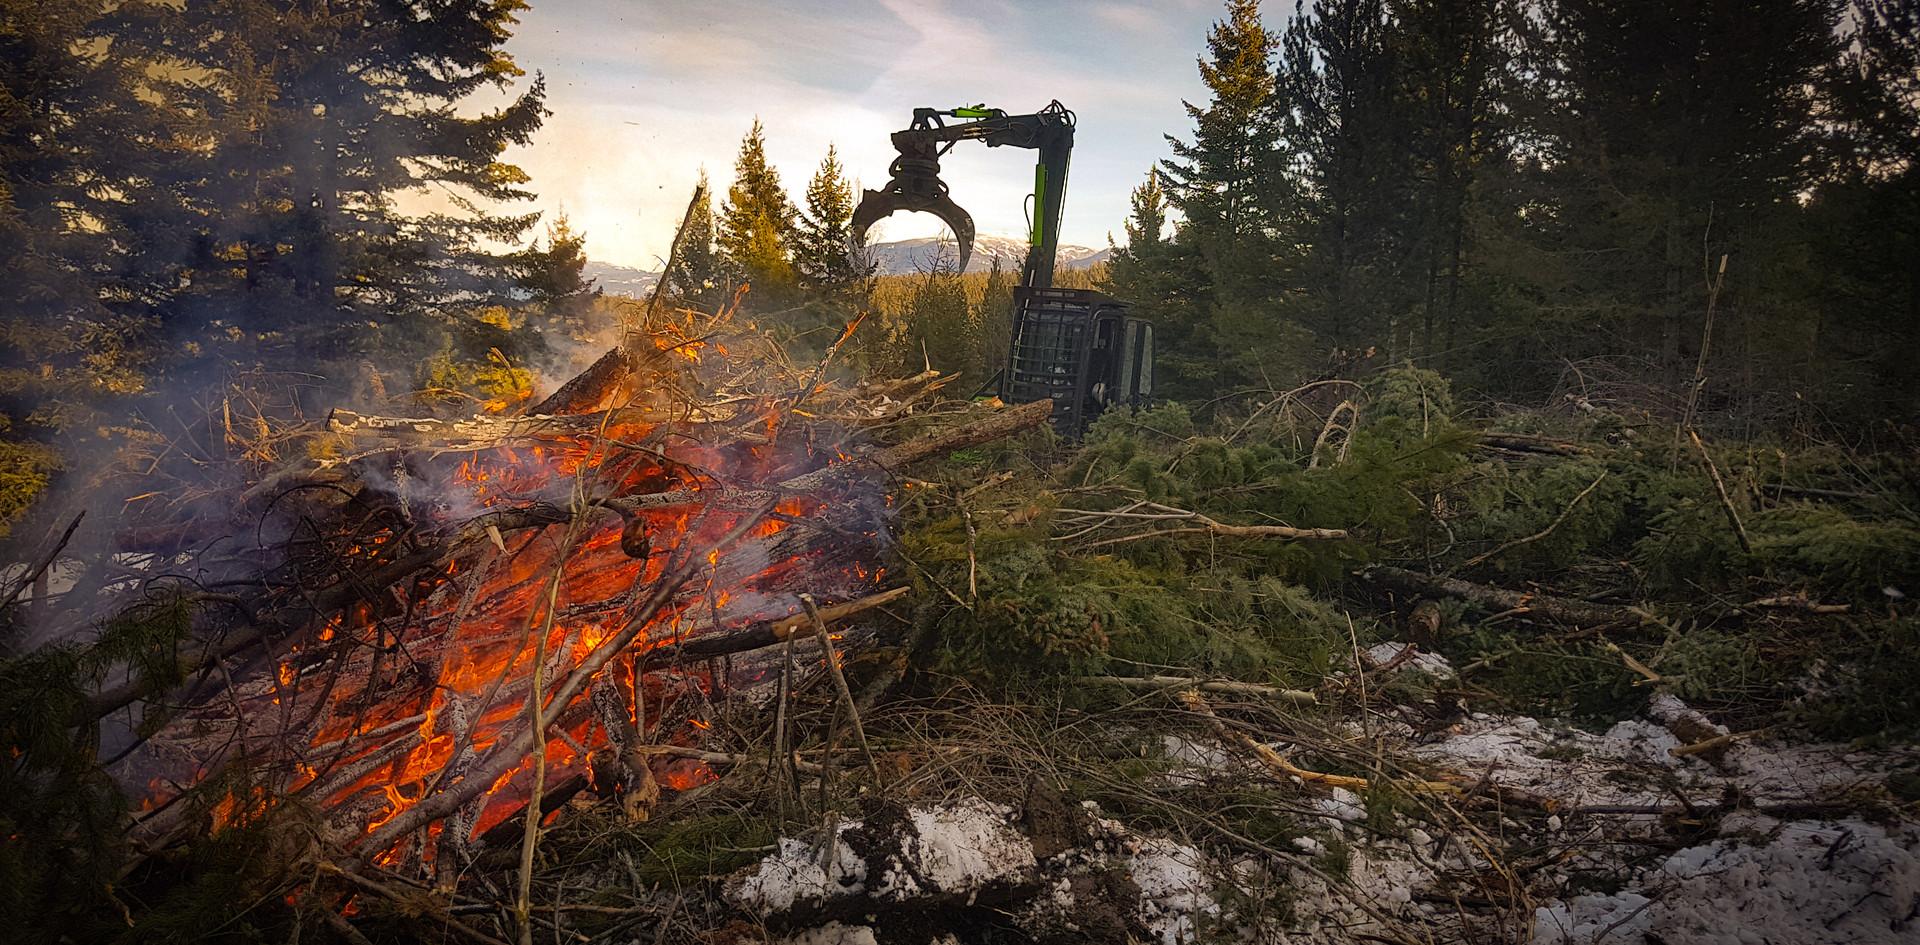 Burn Pile Management